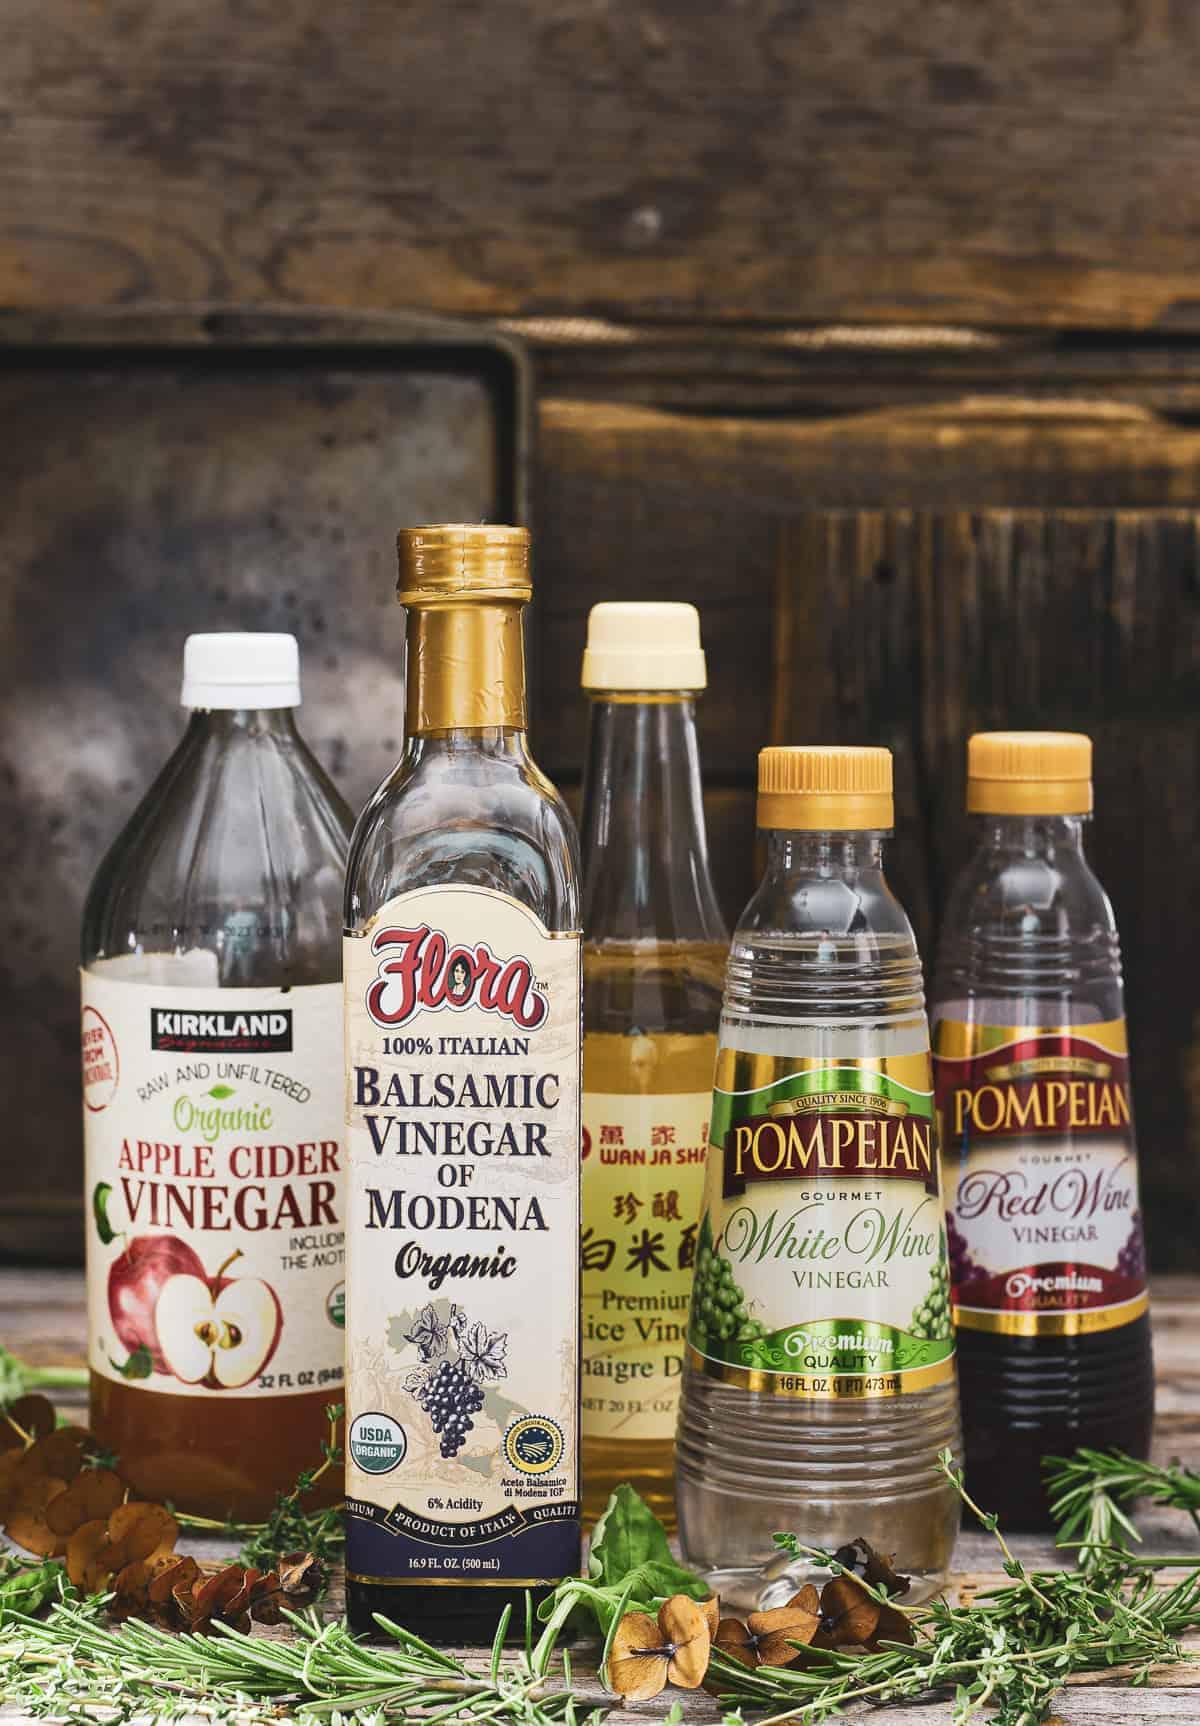 Five bottles of different types of vinegar.